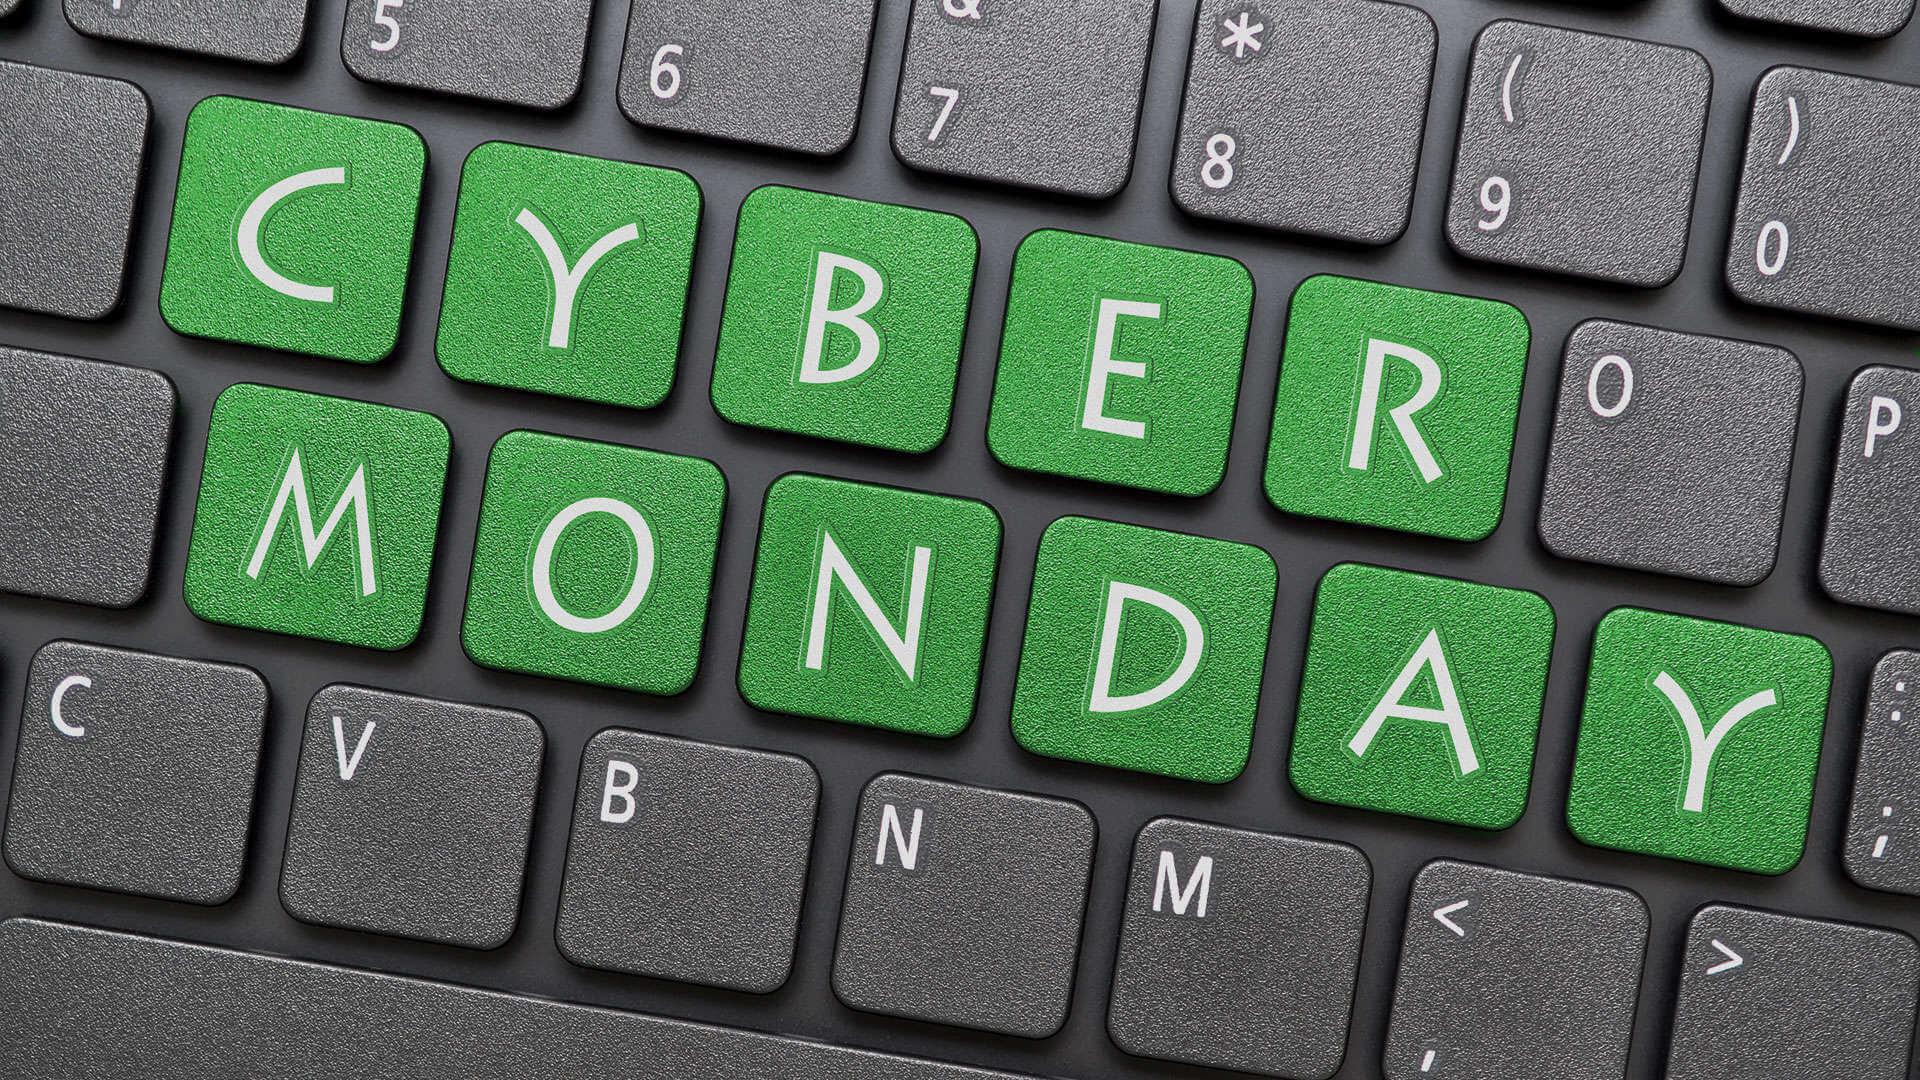 Cyber Monday TV Deals 2019